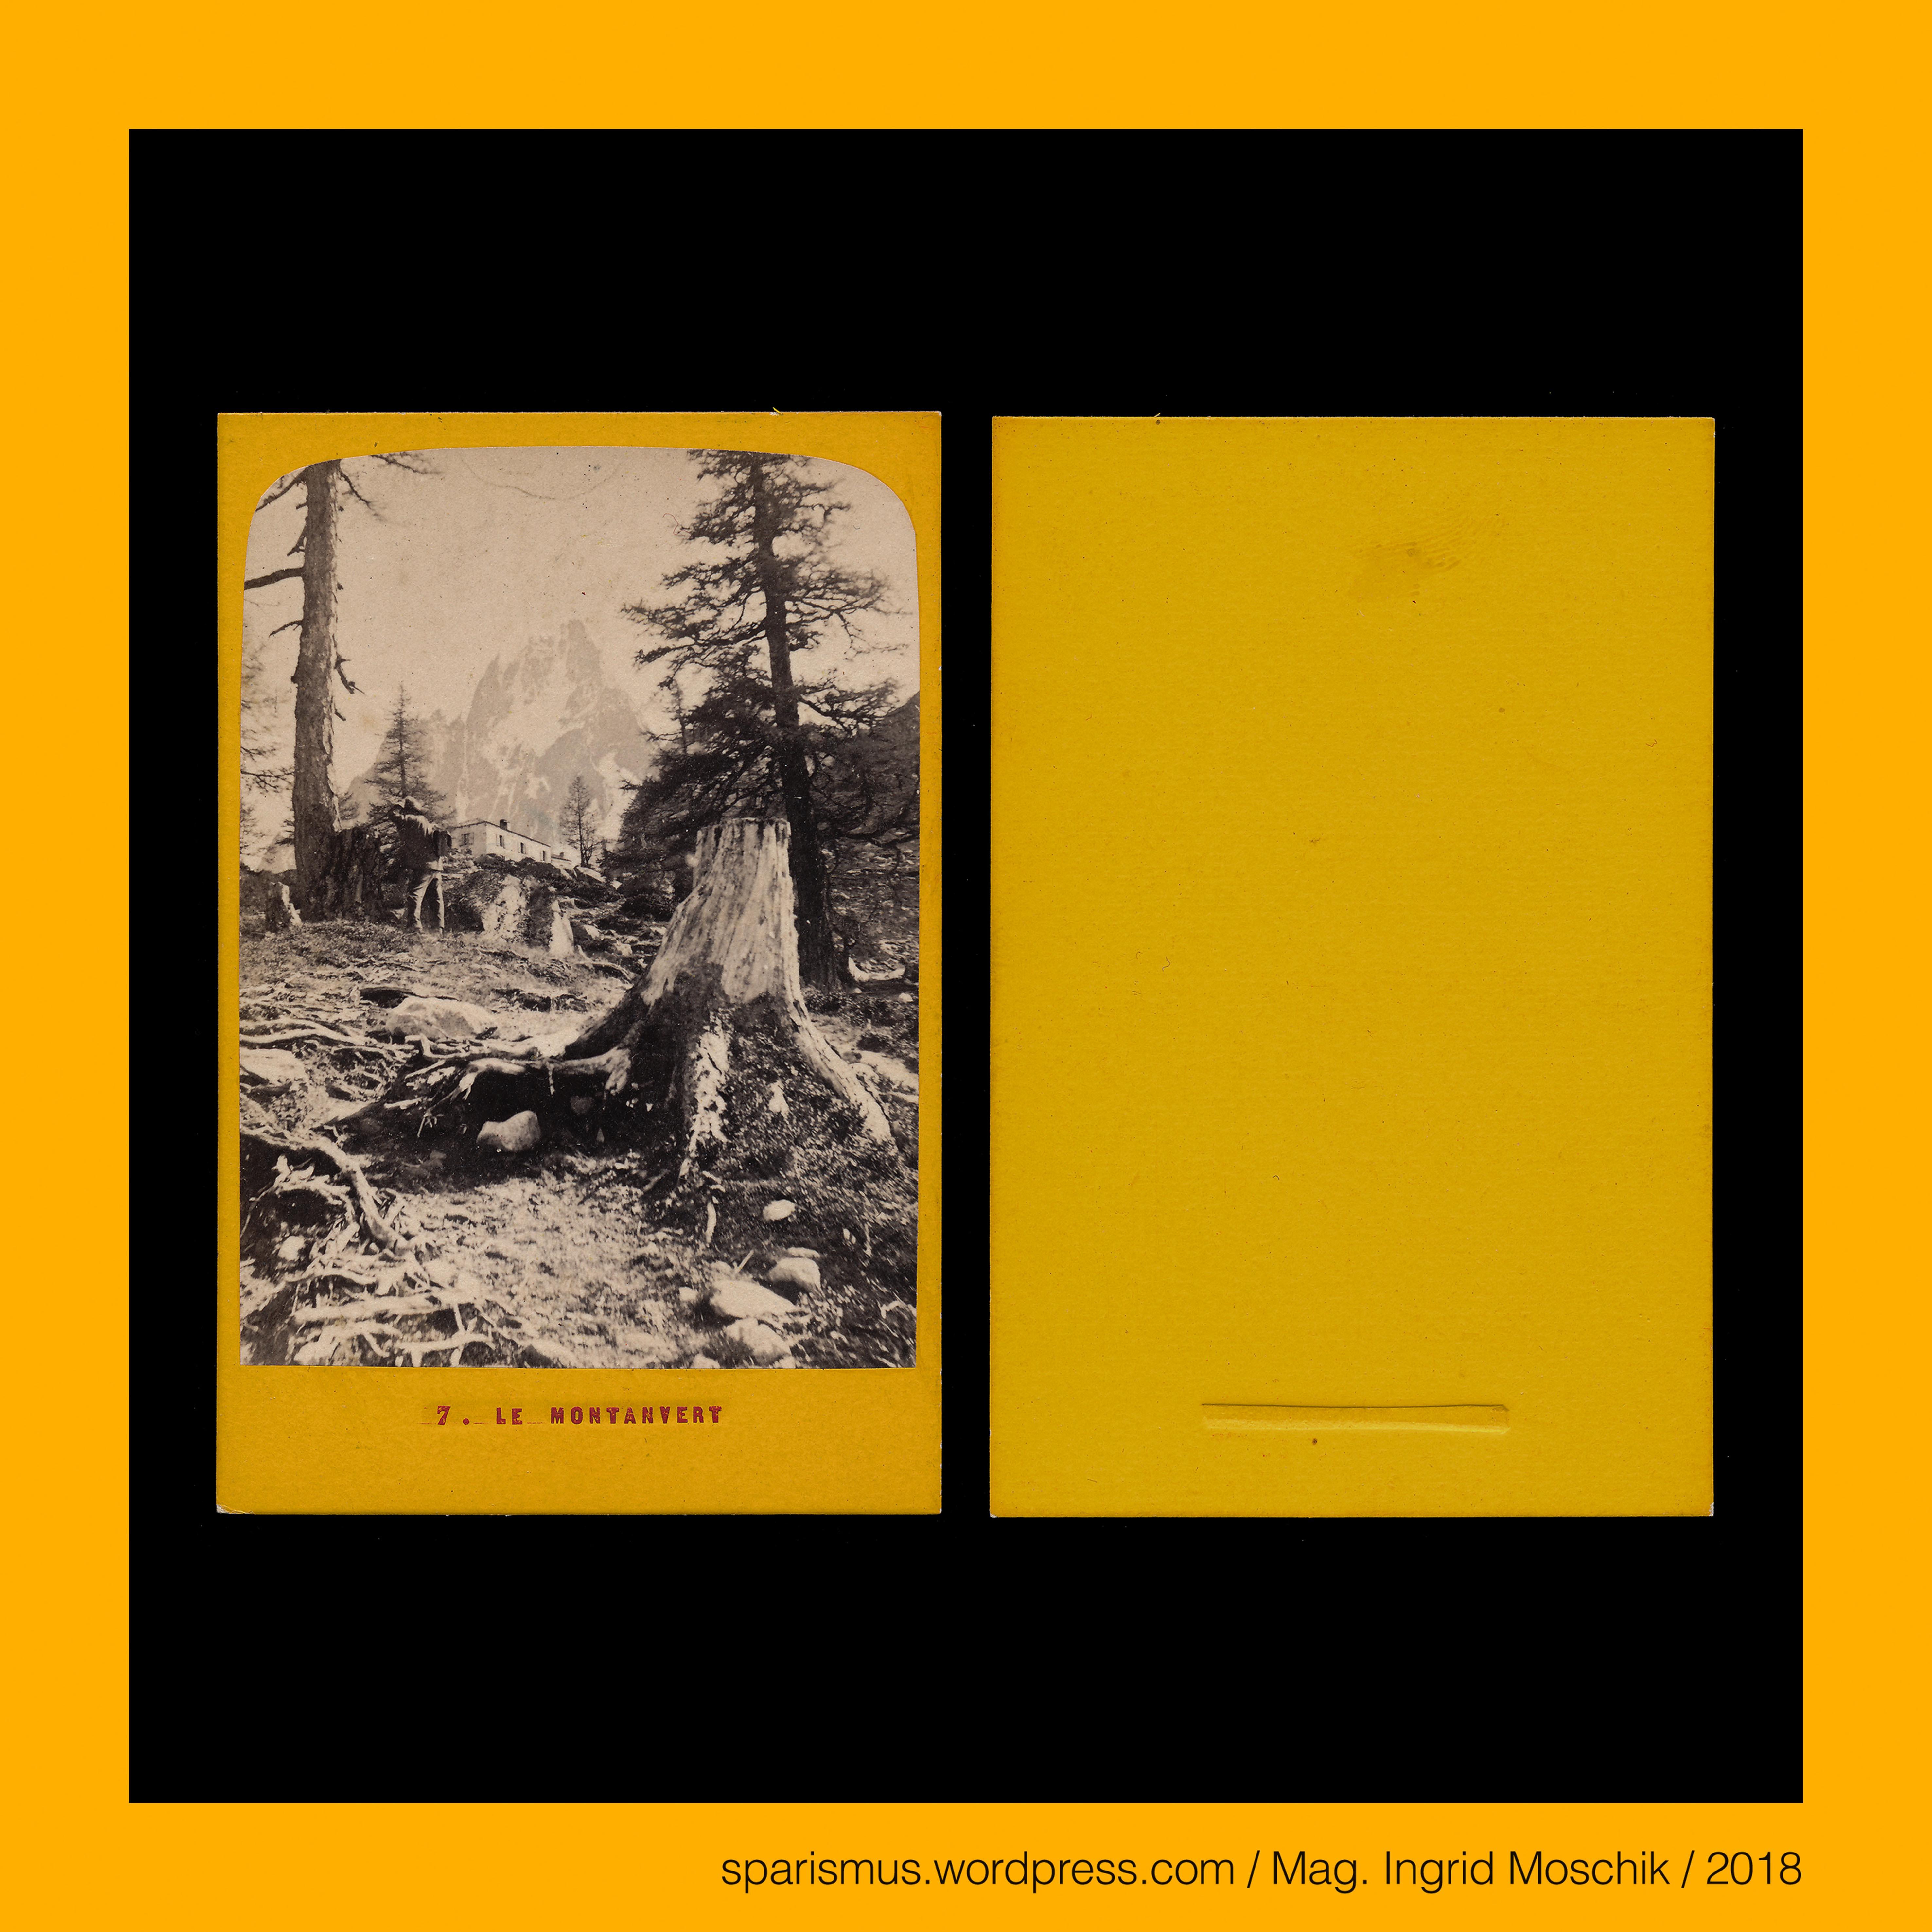 Joseph tairraz 1827 chamonix 1902 chamonix guide de montagne et photographe a